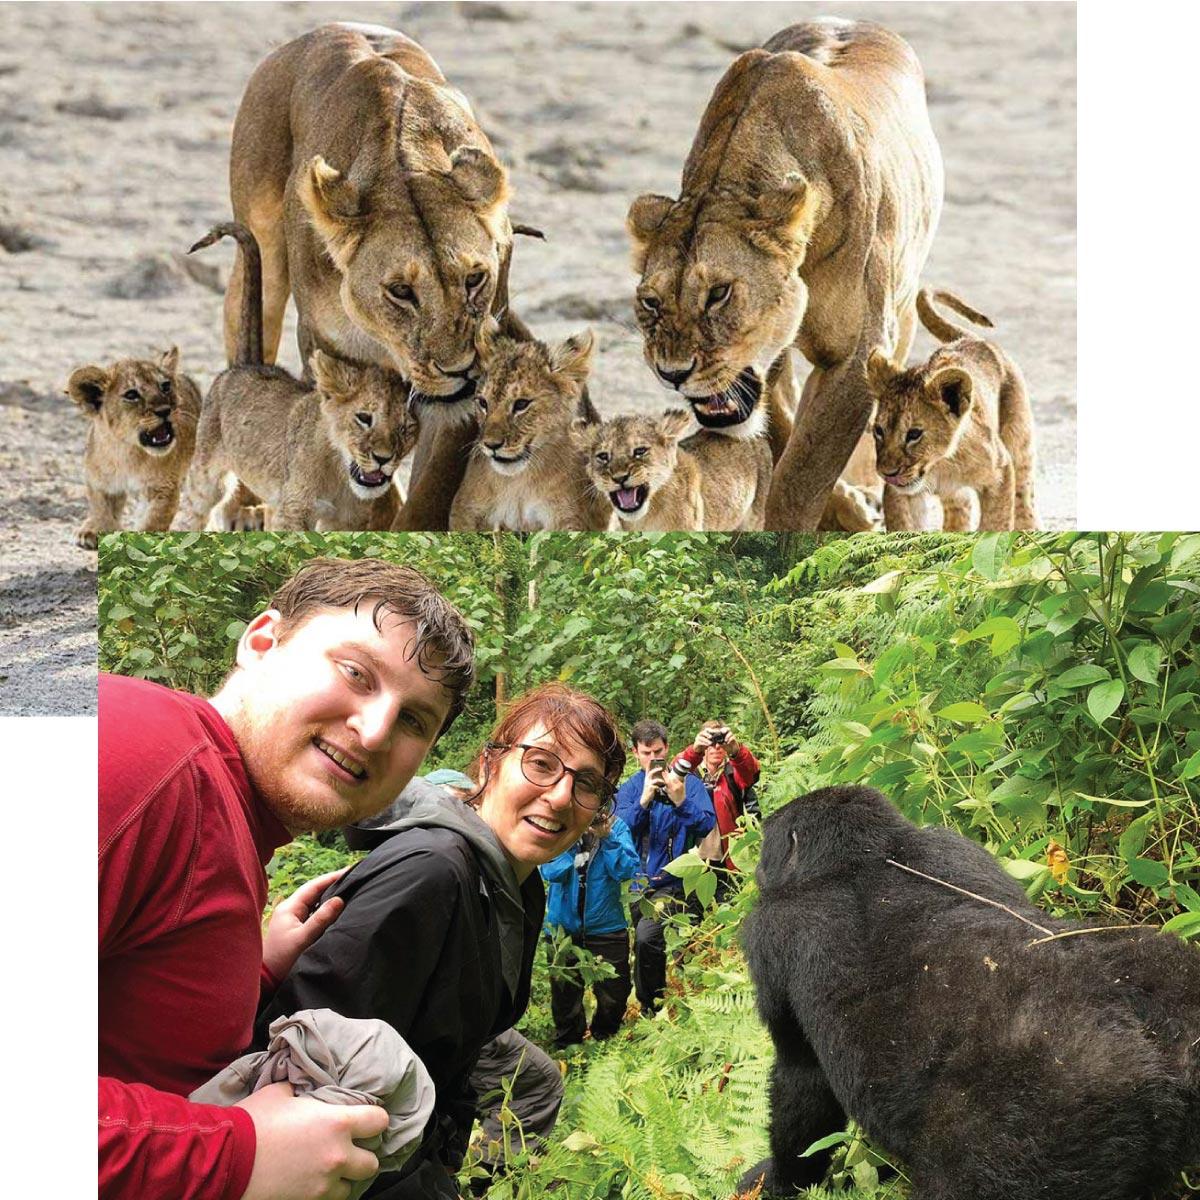 AFrica safari 2019 - AFRICA, THE ULTIMATE ADVENTURE: Savannah Wildlife, Chimpanzee Tracking, And Gorilla Safari